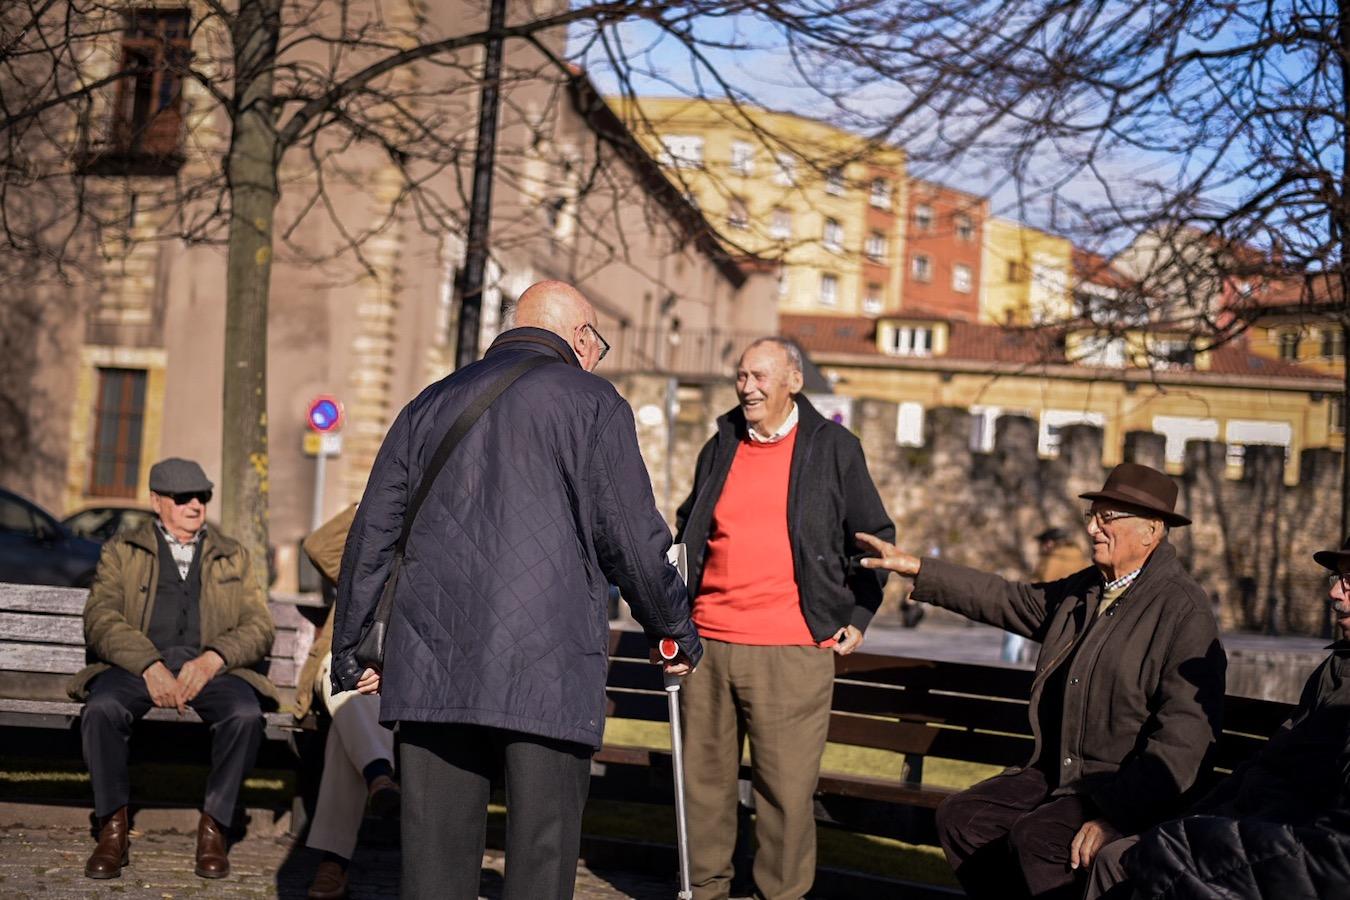 Street life in Gijon, Asturias, northern Spain